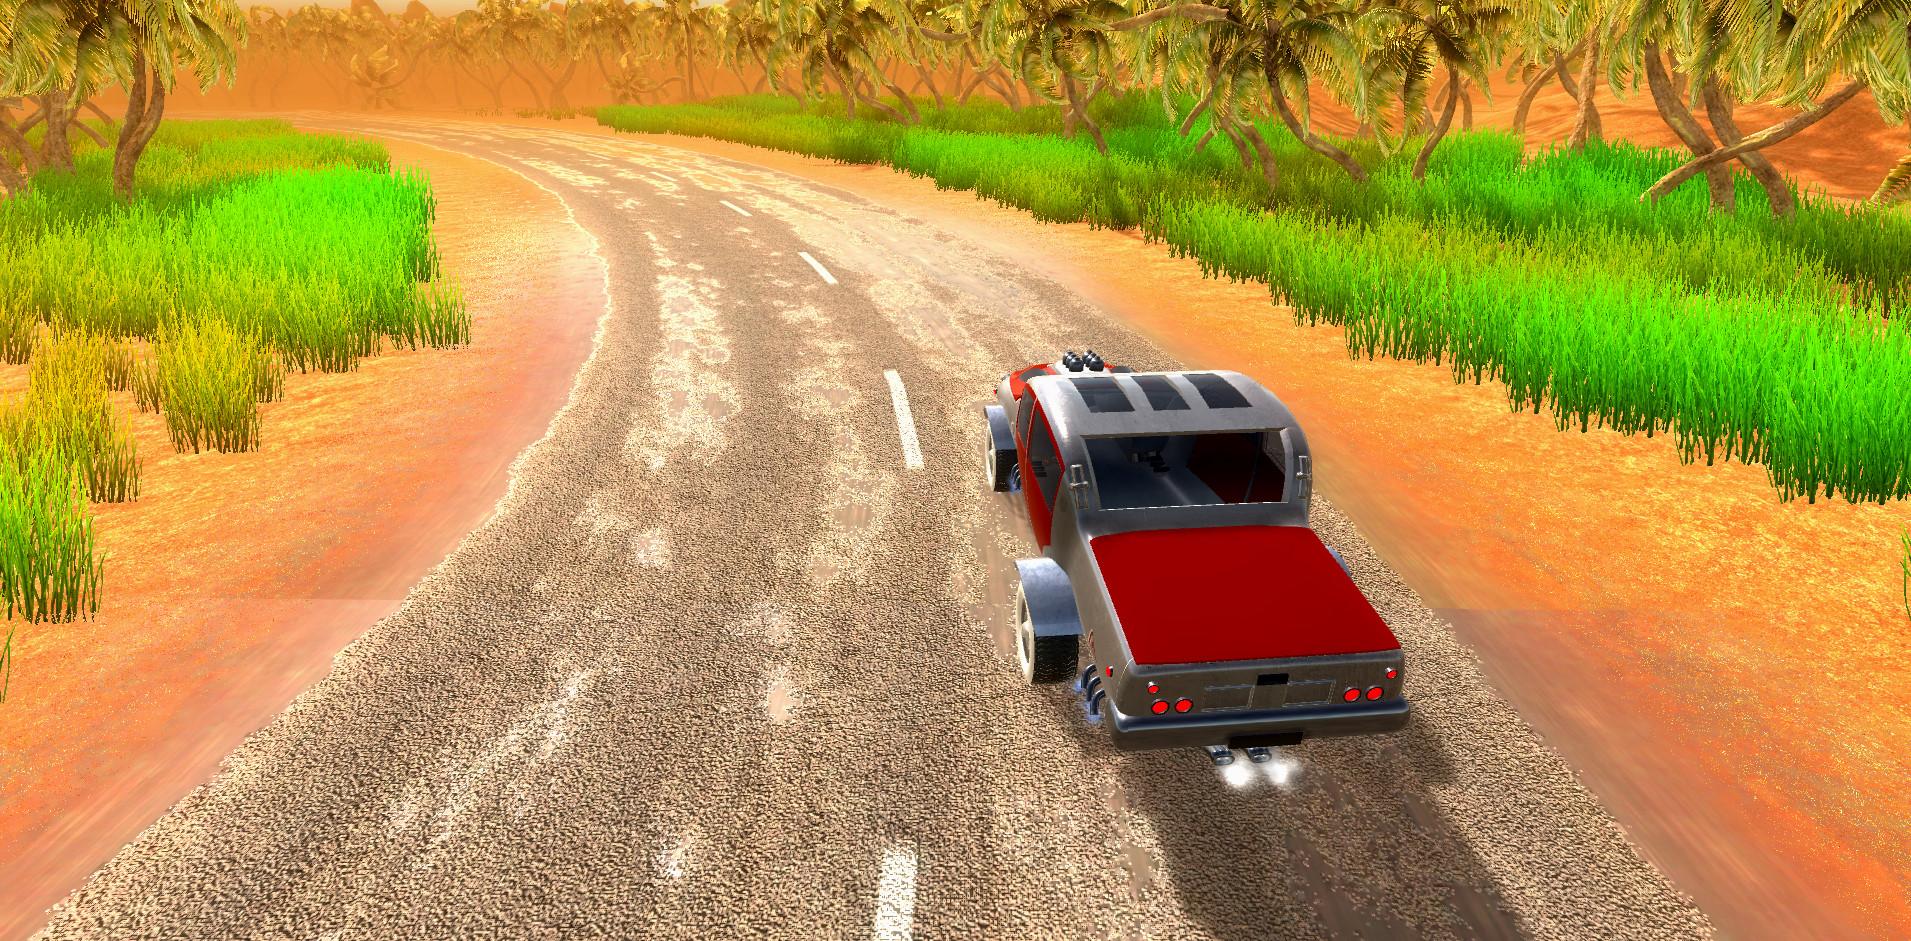 RoadWithWetSide.jpg